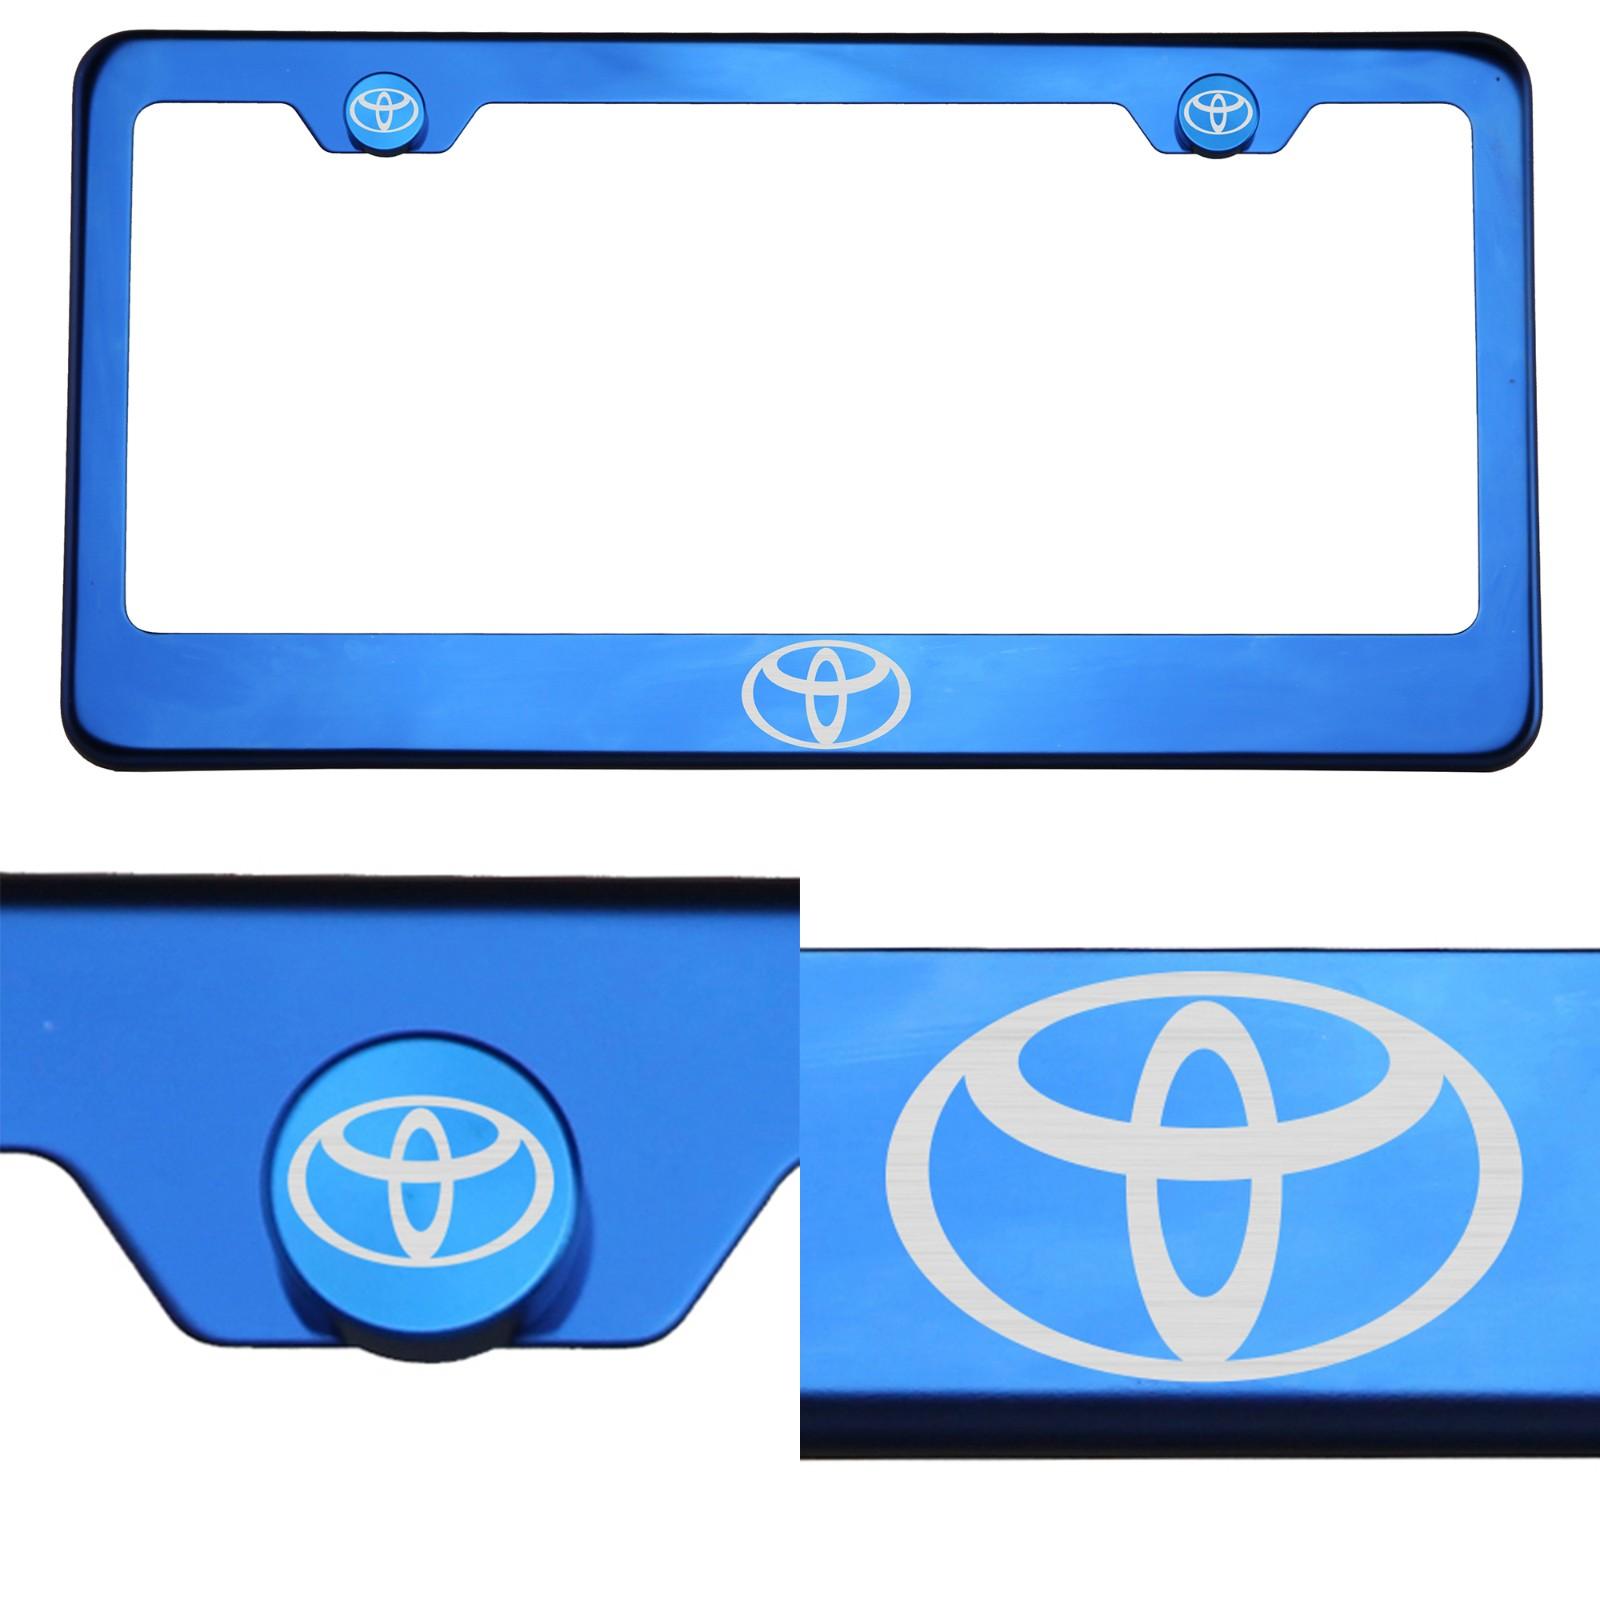 Mirror Polished Stainless Steel Laser Engraved License Plate Frame Holder Subaru